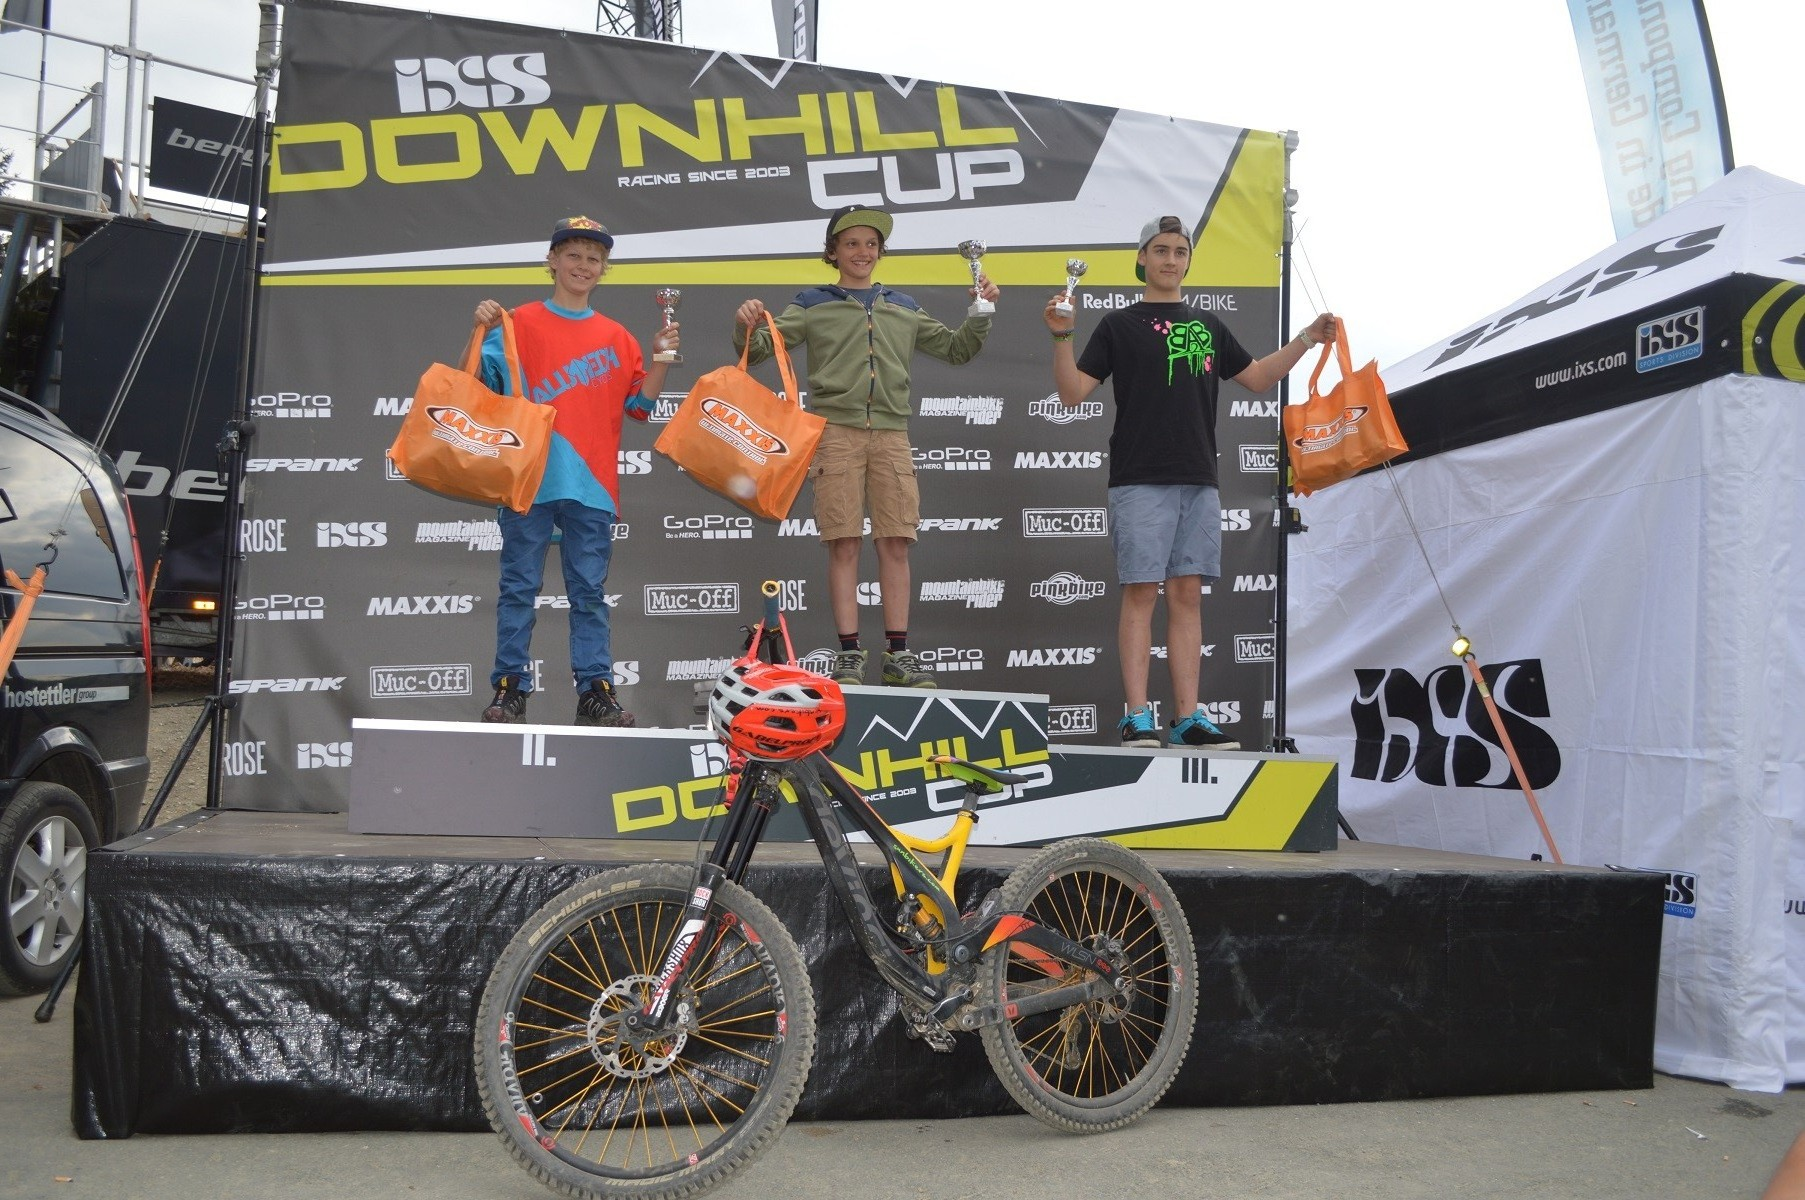 2. Platz beim Downhill Rookie Cup 2015 Winterberg (GER)